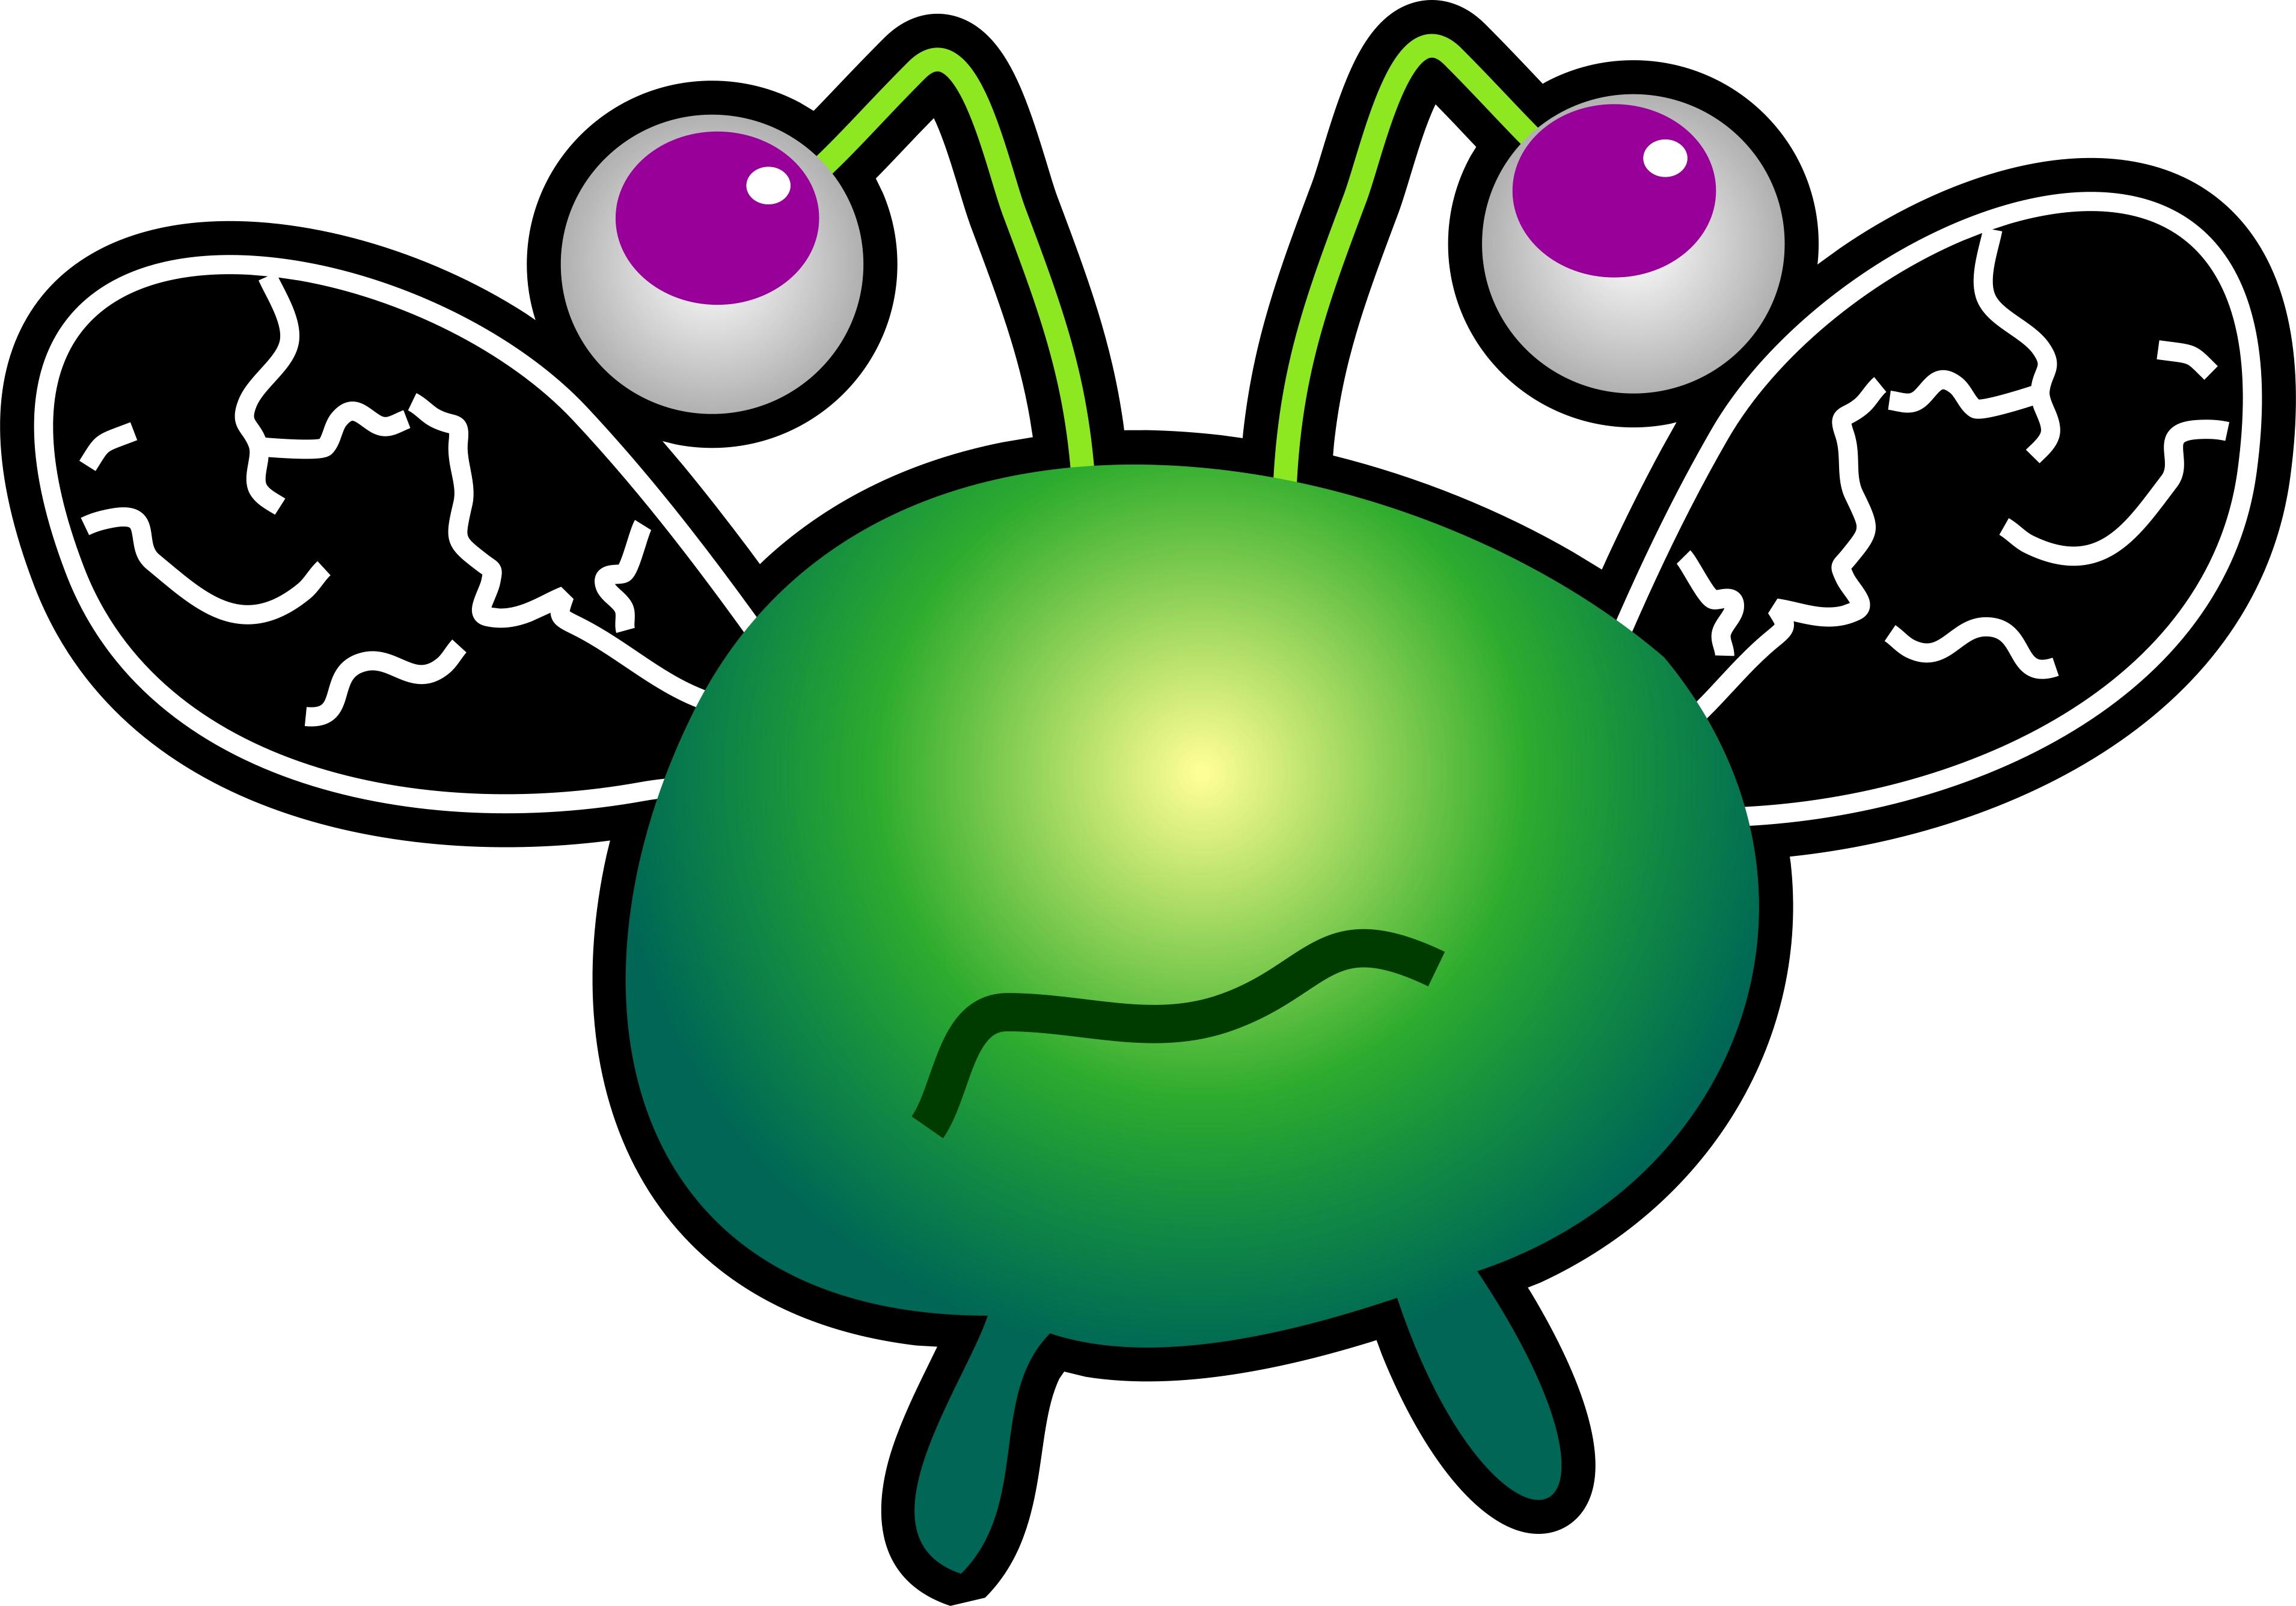 Germ Virus | Free Images at Clker.com - vector clip art ...